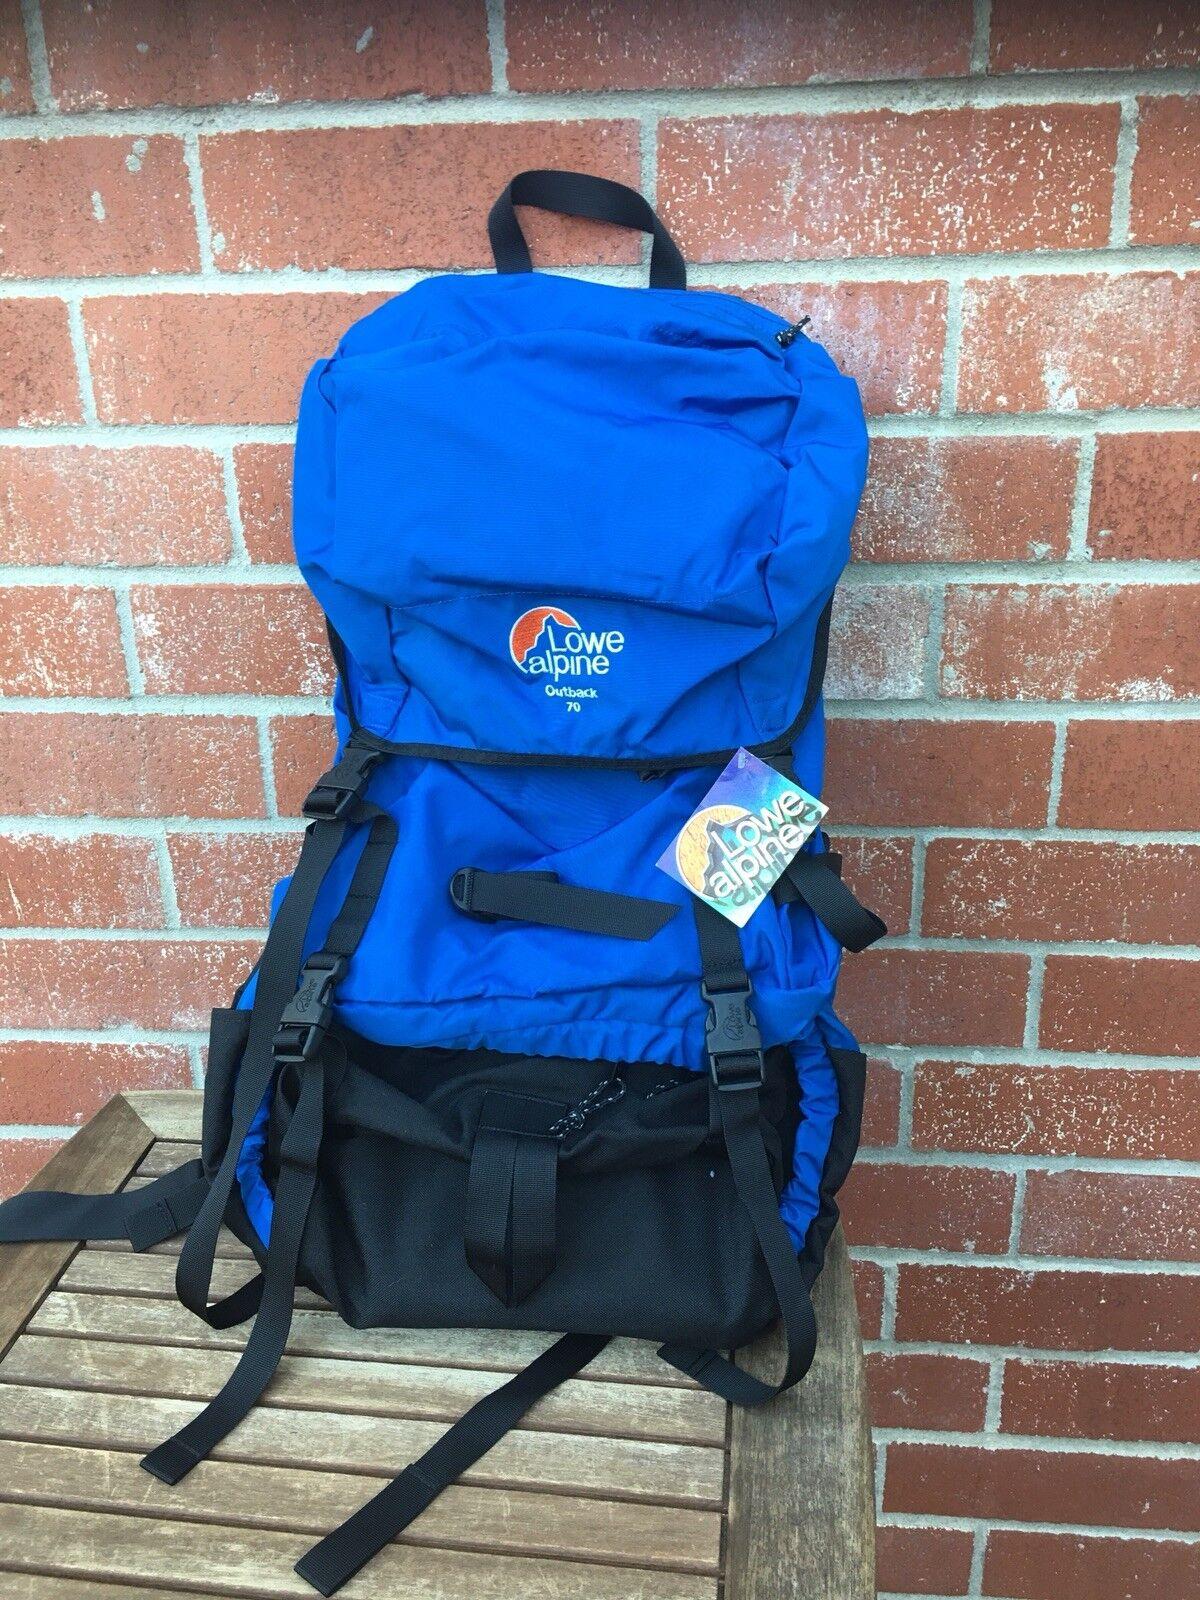 Lowe Alpine Outback 70 Internal Frame Hiking Camping Boy Scout Trekking Backpack